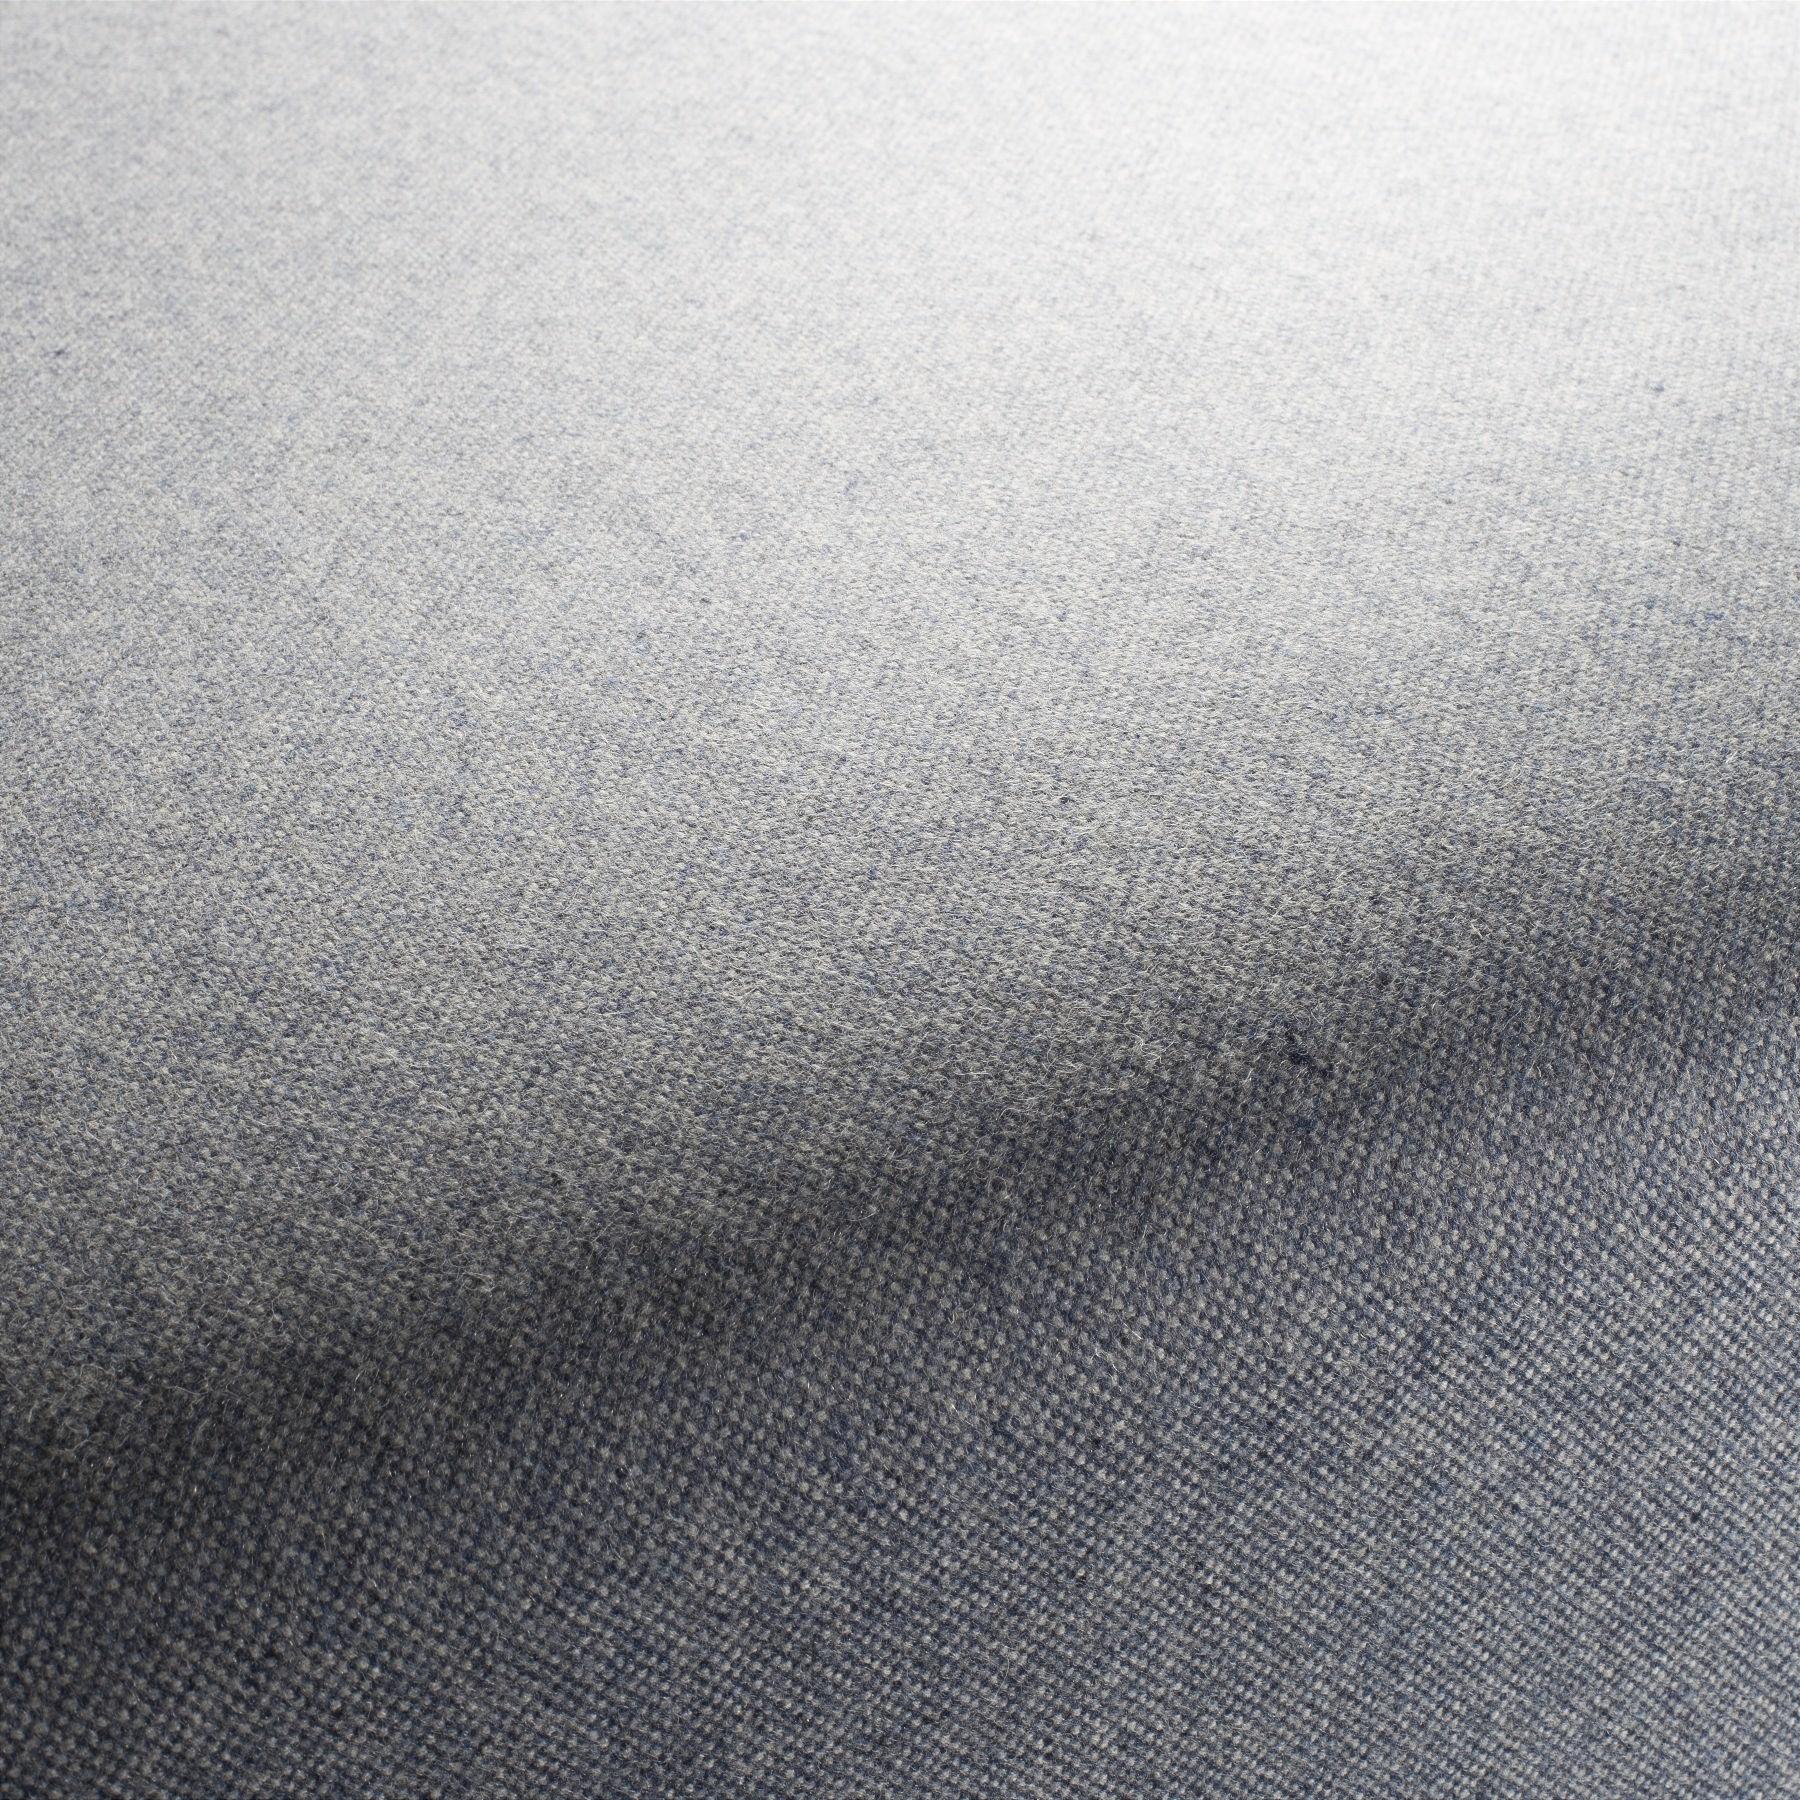 upholstery fabric cushy wool 1 1306 050 jab anstoetz fabrics. Black Bedroom Furniture Sets. Home Design Ideas